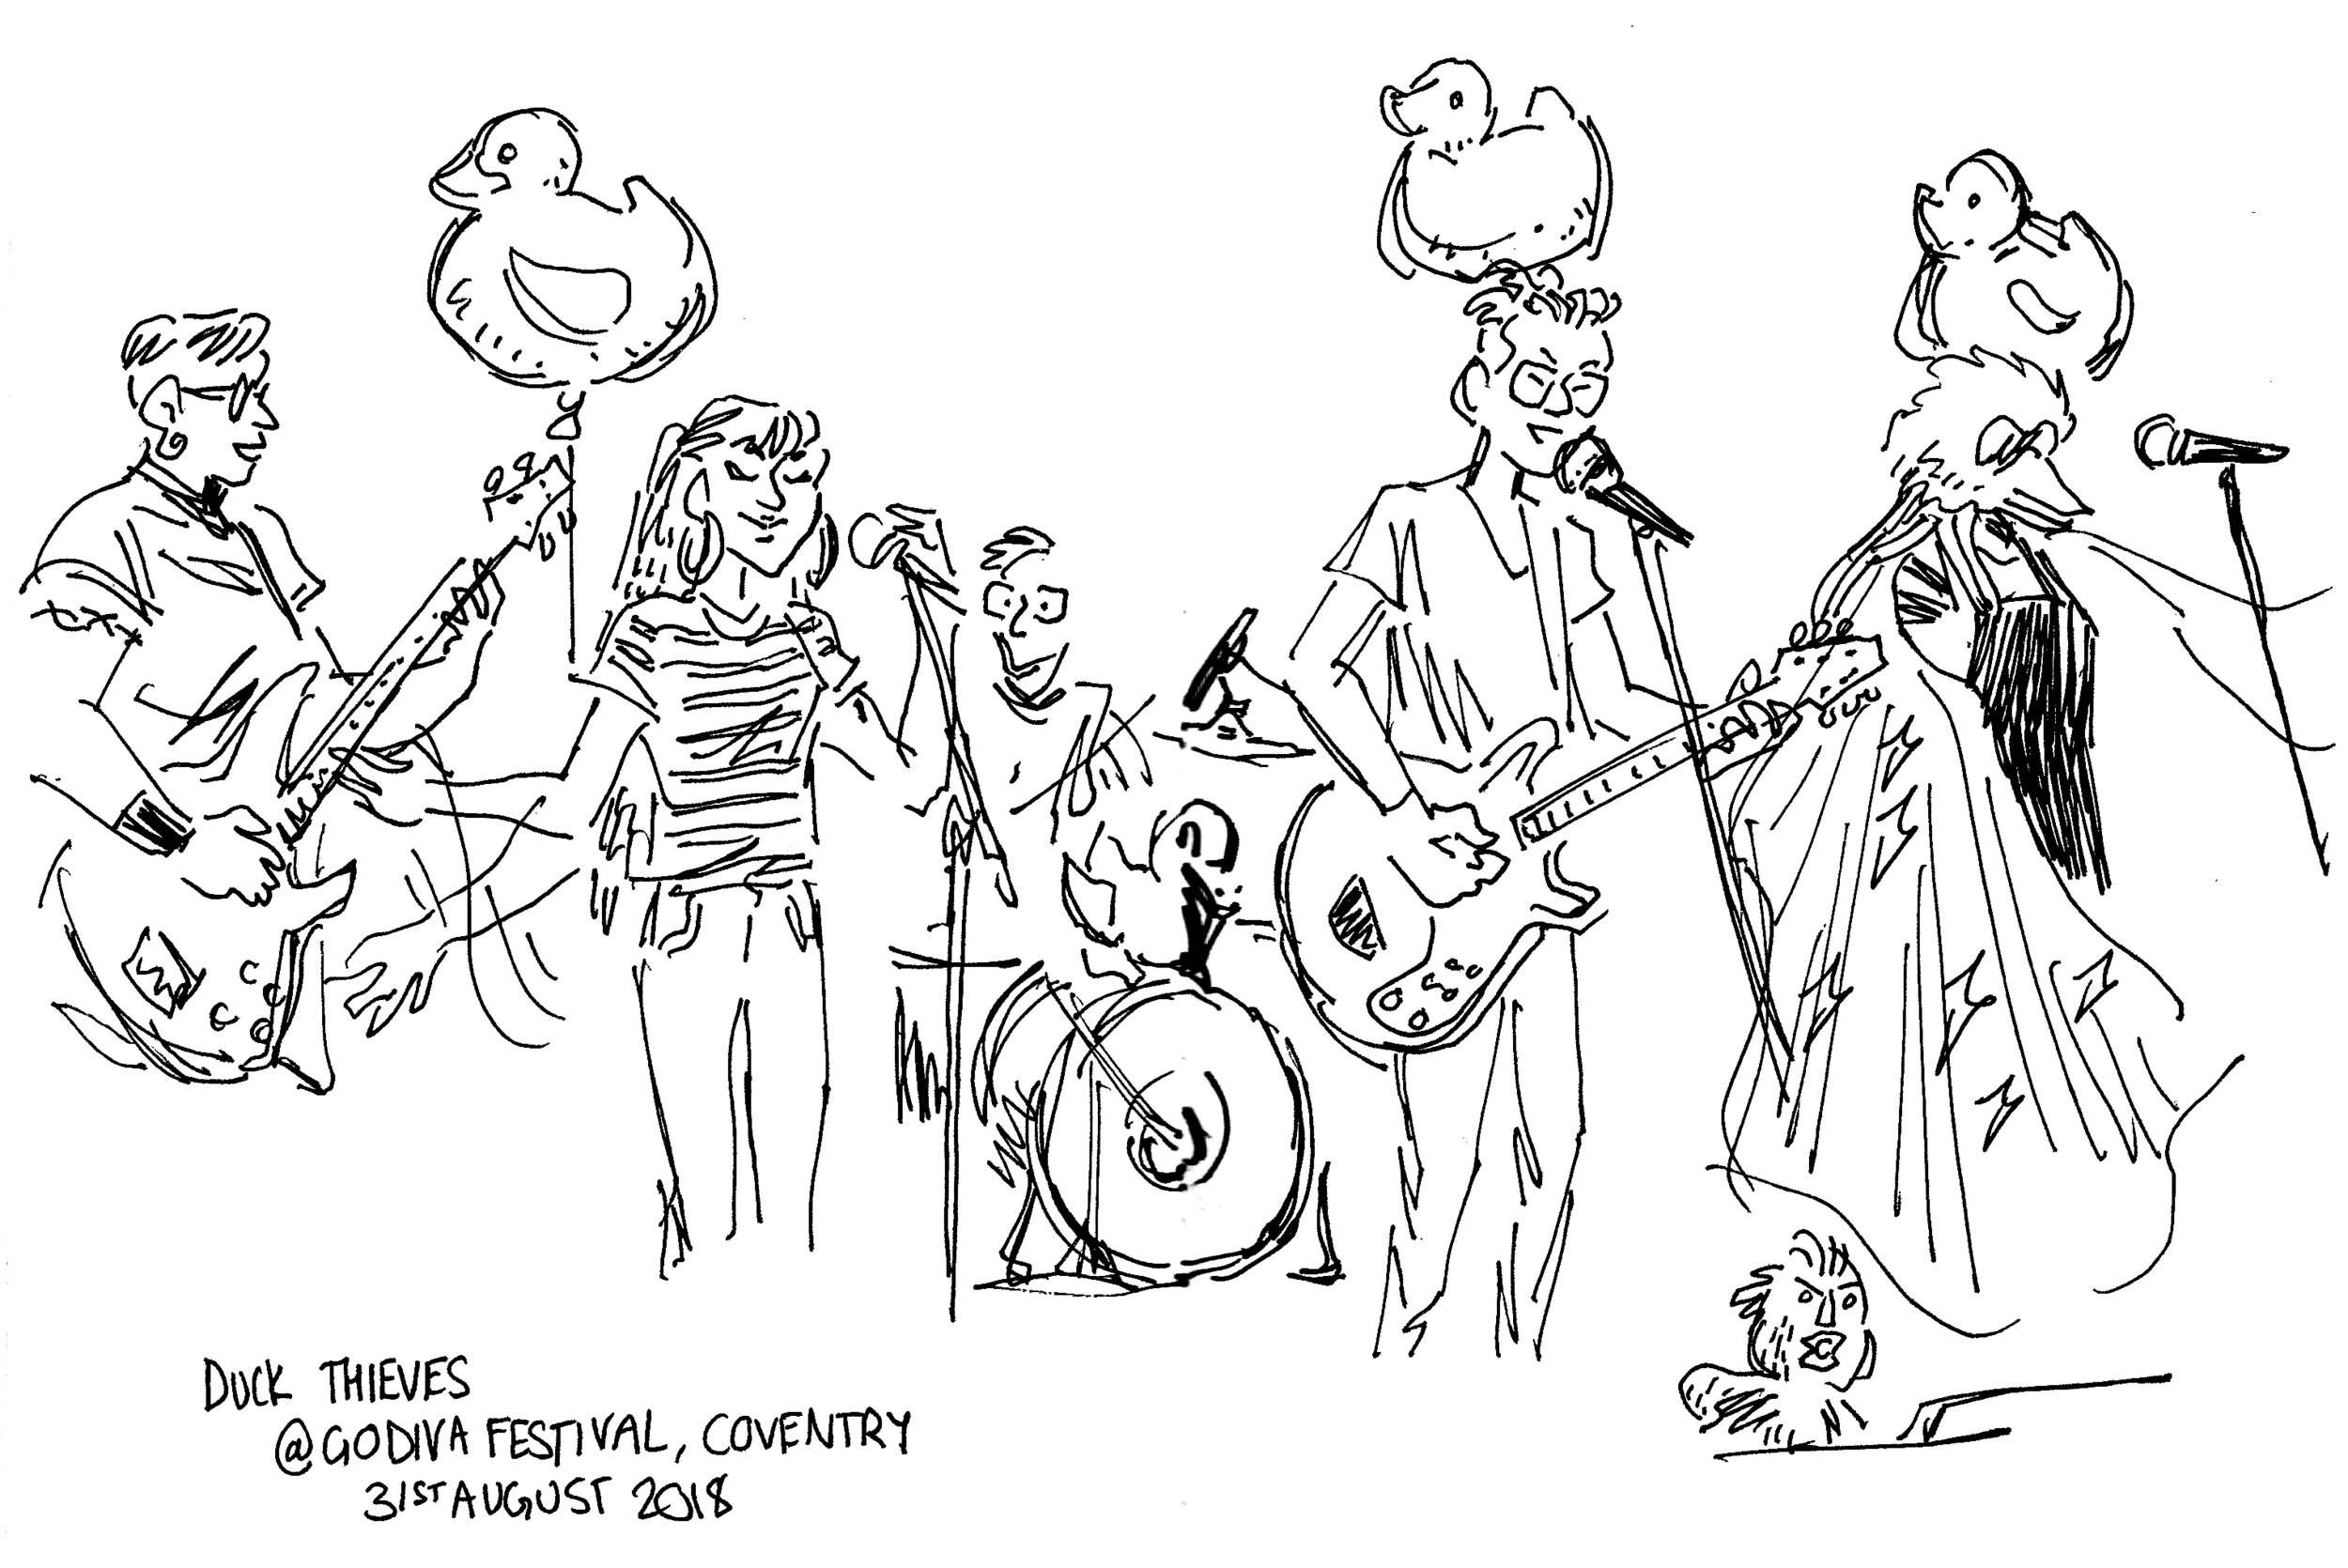 gig sketches (242).jpg